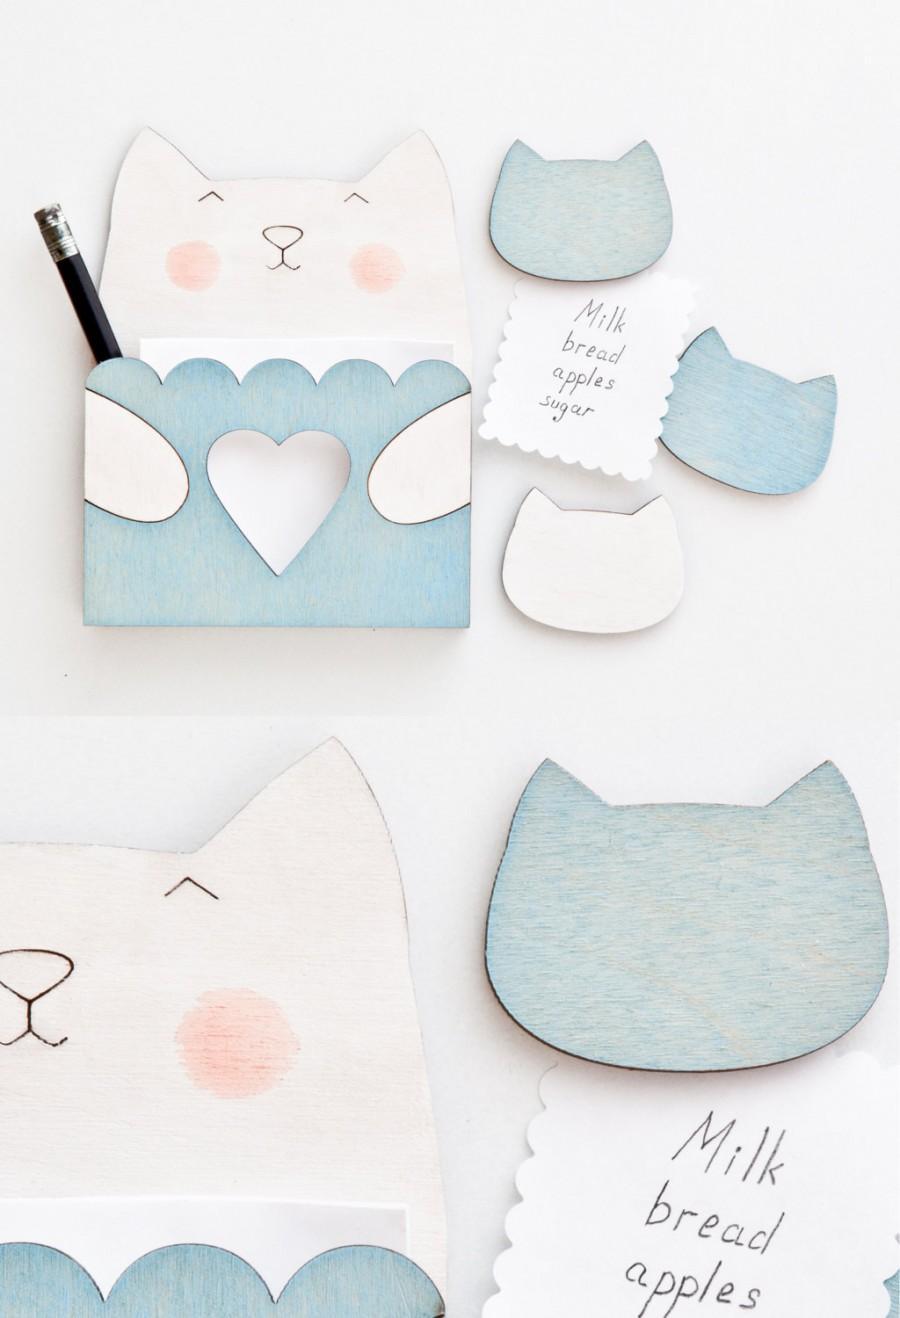 New Kitchen Gift Cat Magnets Blue Kitchen Decor To Do List Fridge Magnets Many